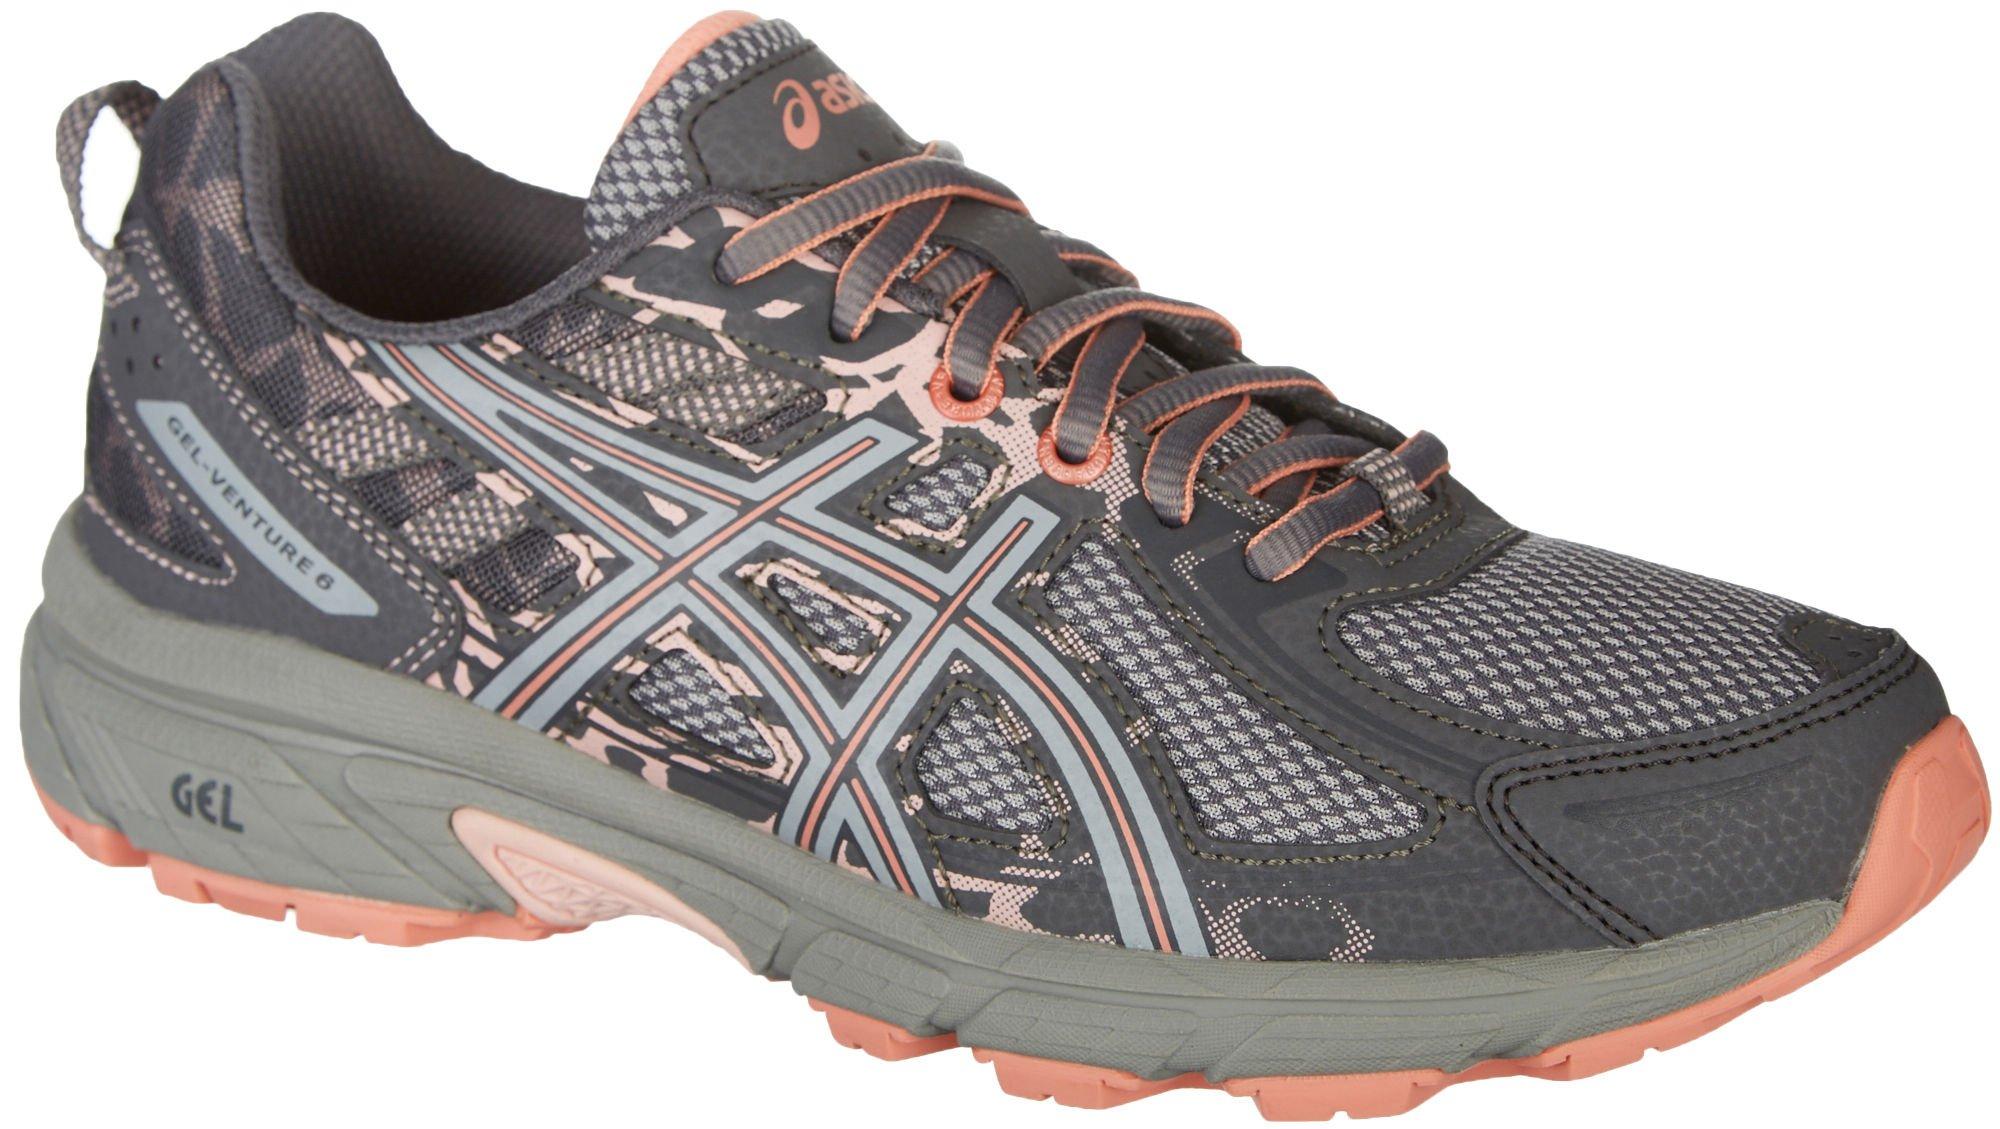 ASICS Womens Gel-Venture 6 Carbon/Mid Grey/Seashell Pink Running Shoe - 8.5 by ASICS (Image #1)